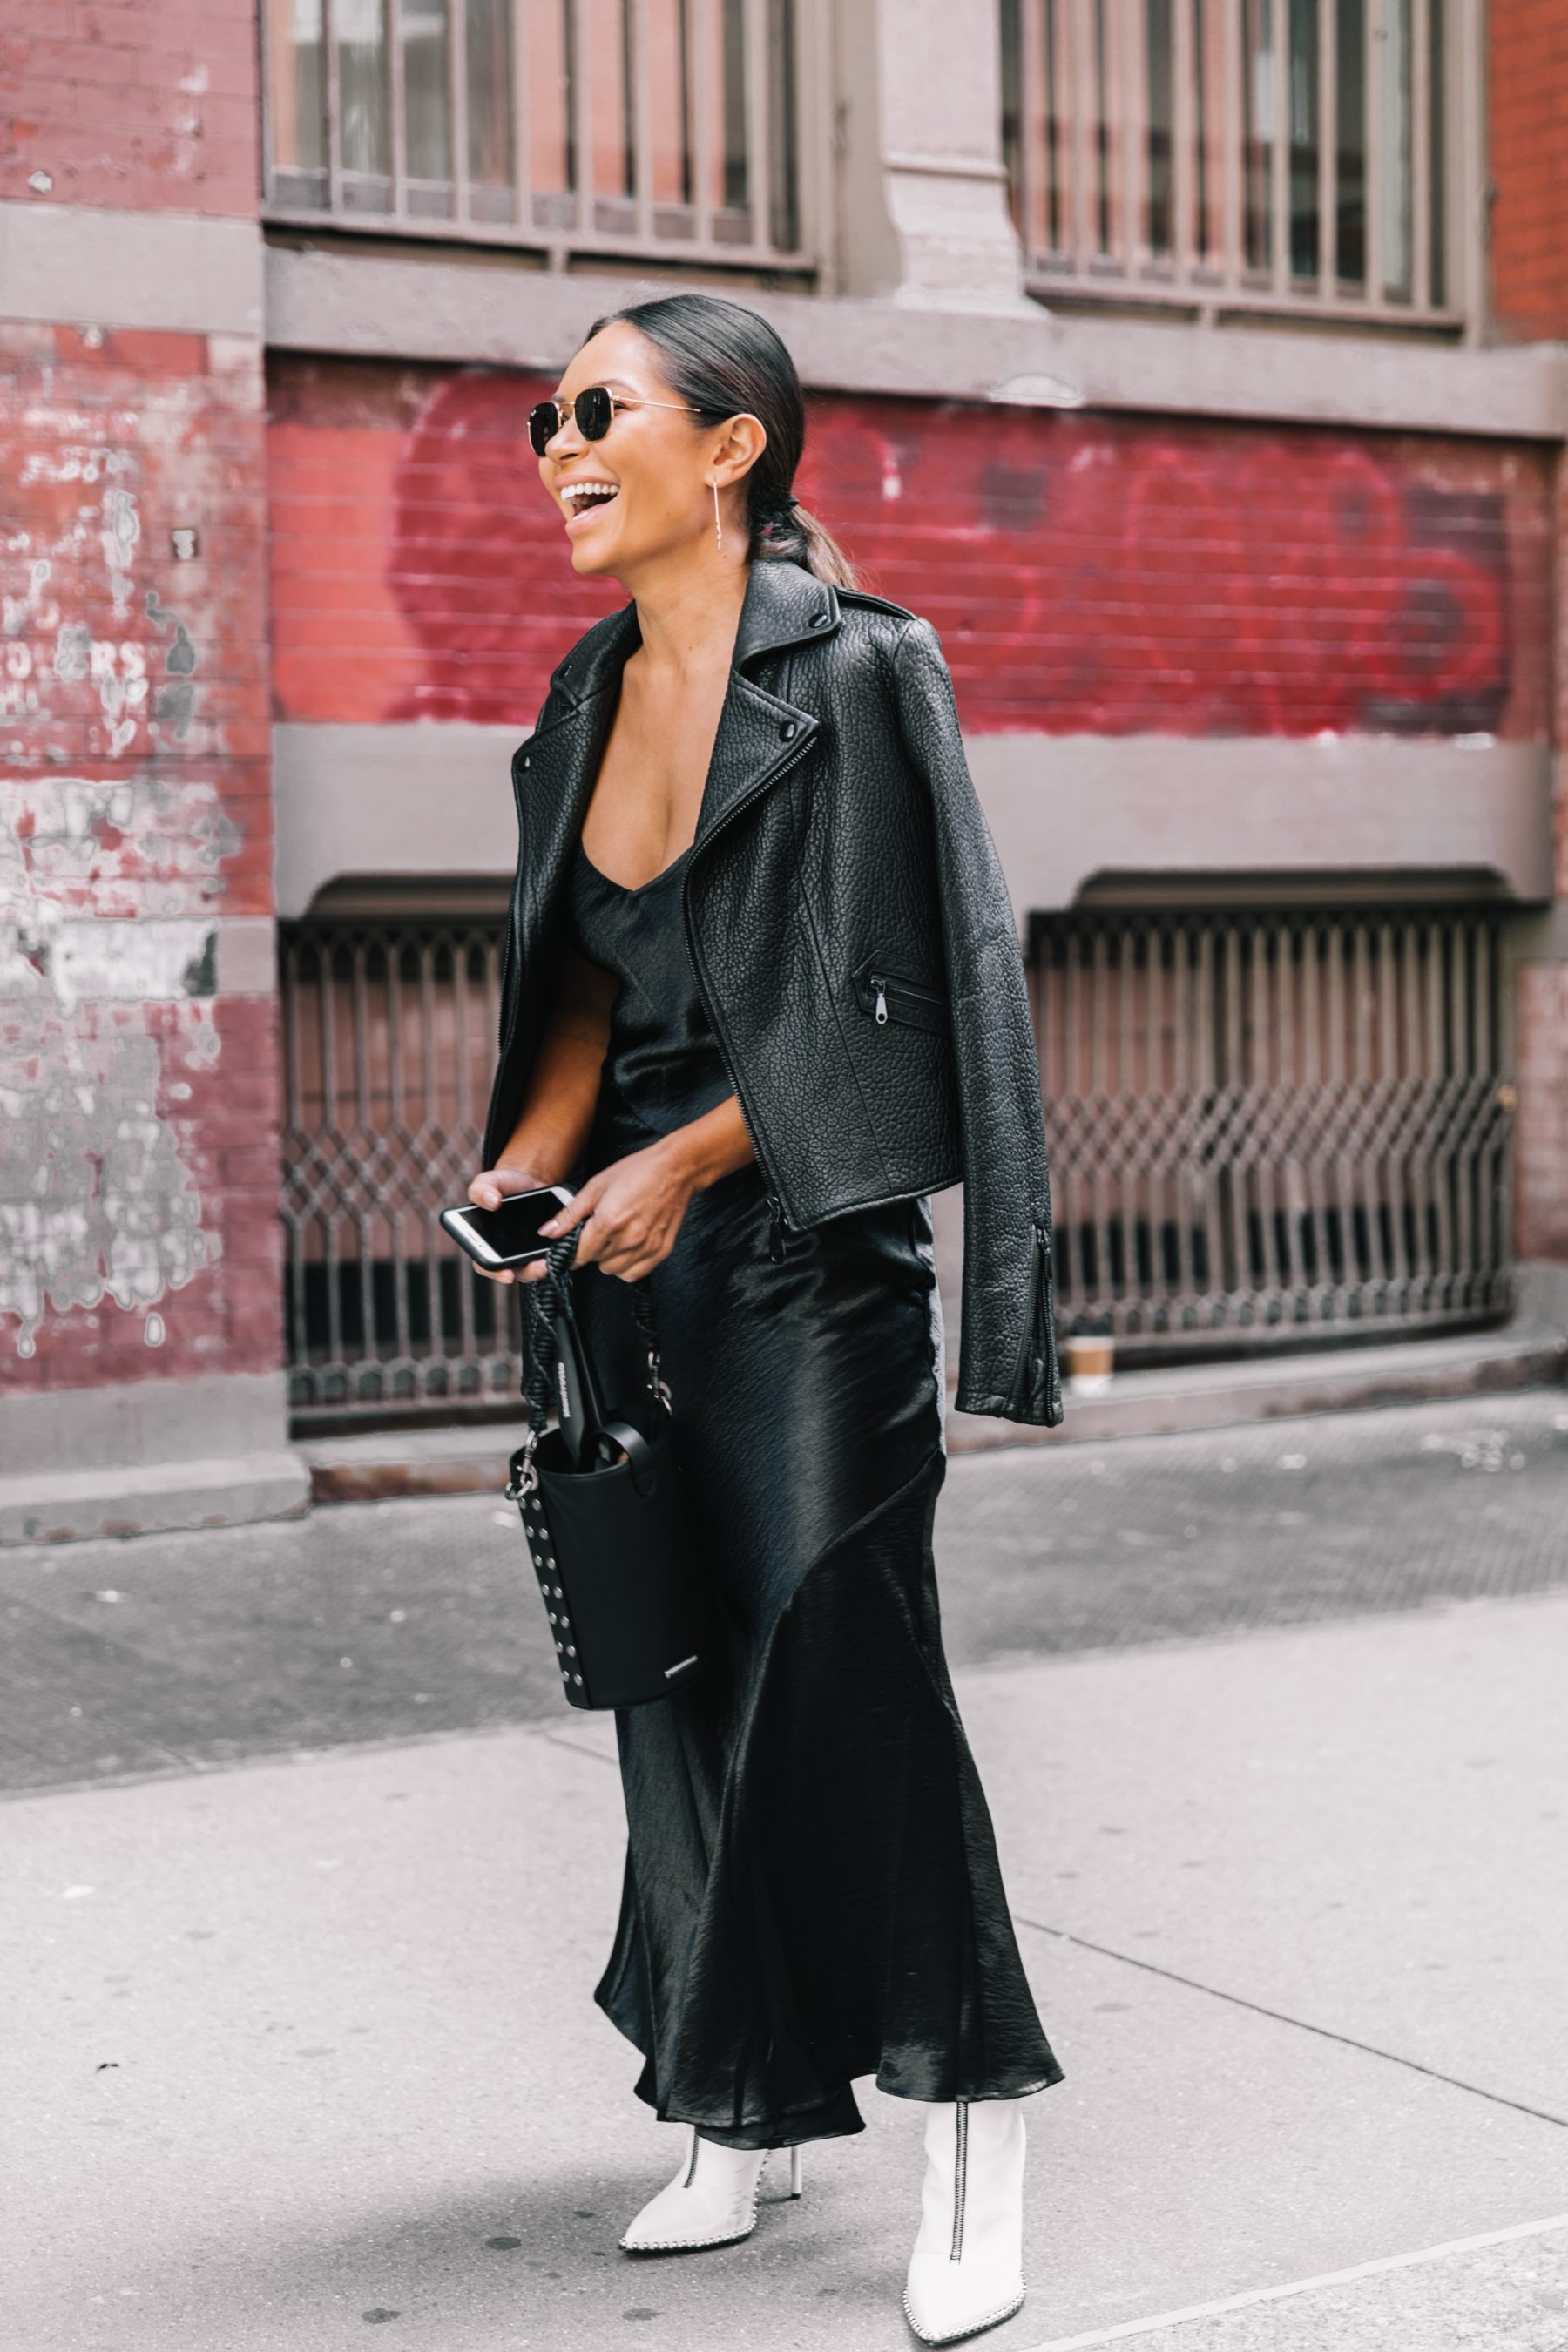 NYFW-SS18-New_York_Fashion_Week-Street_Style-Vogue-Collage_Vintage-195-1-1800x2700